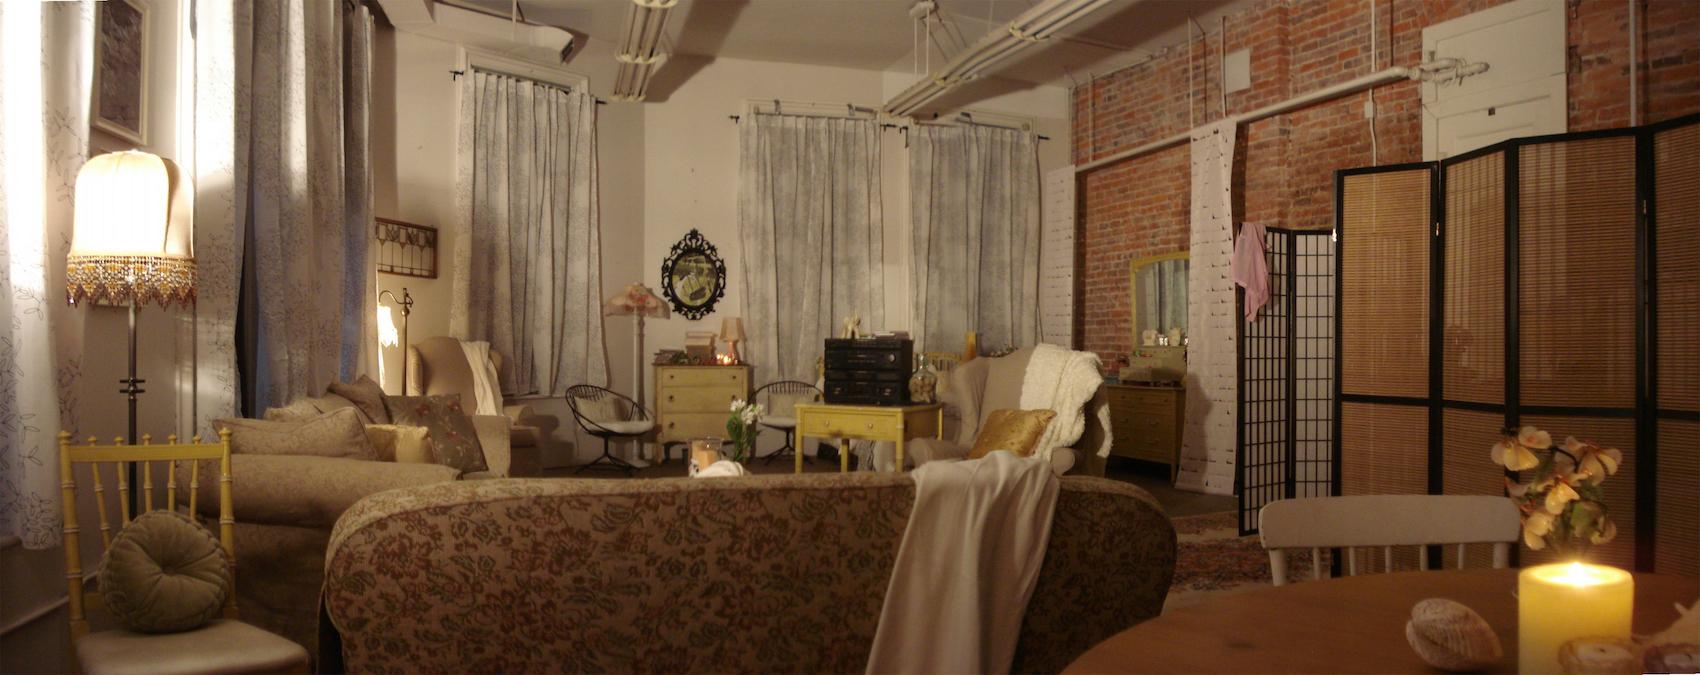 Claire's Apartment